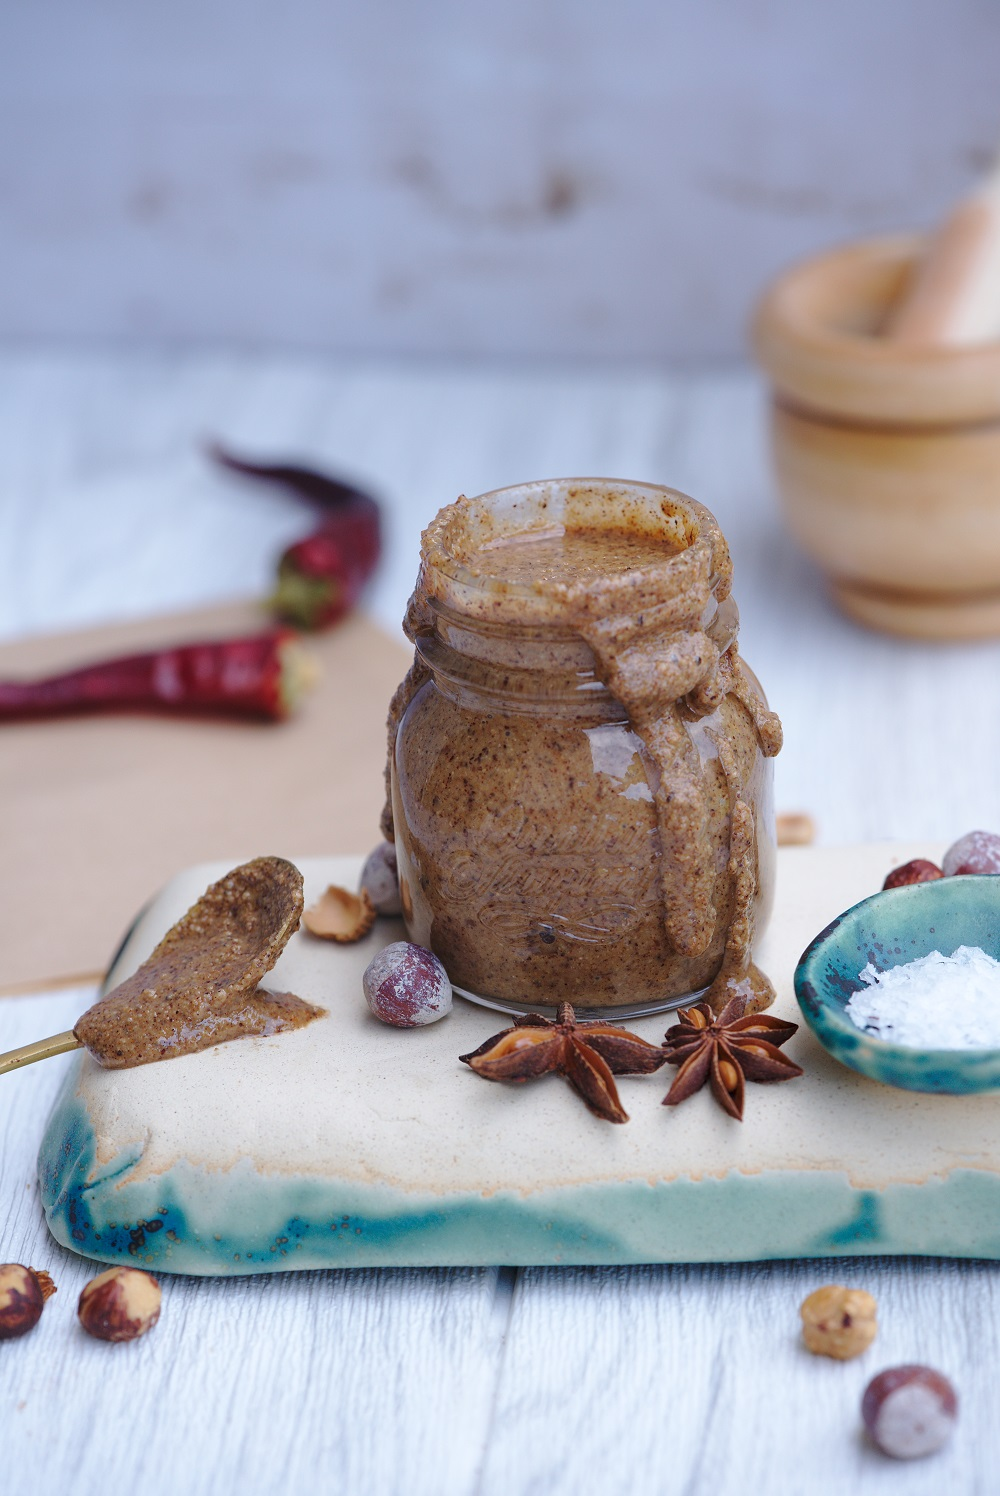 Paleo Vegan Gluten Free Vanilla Hazelnut Butter Recipe - Easy, quick and healthy